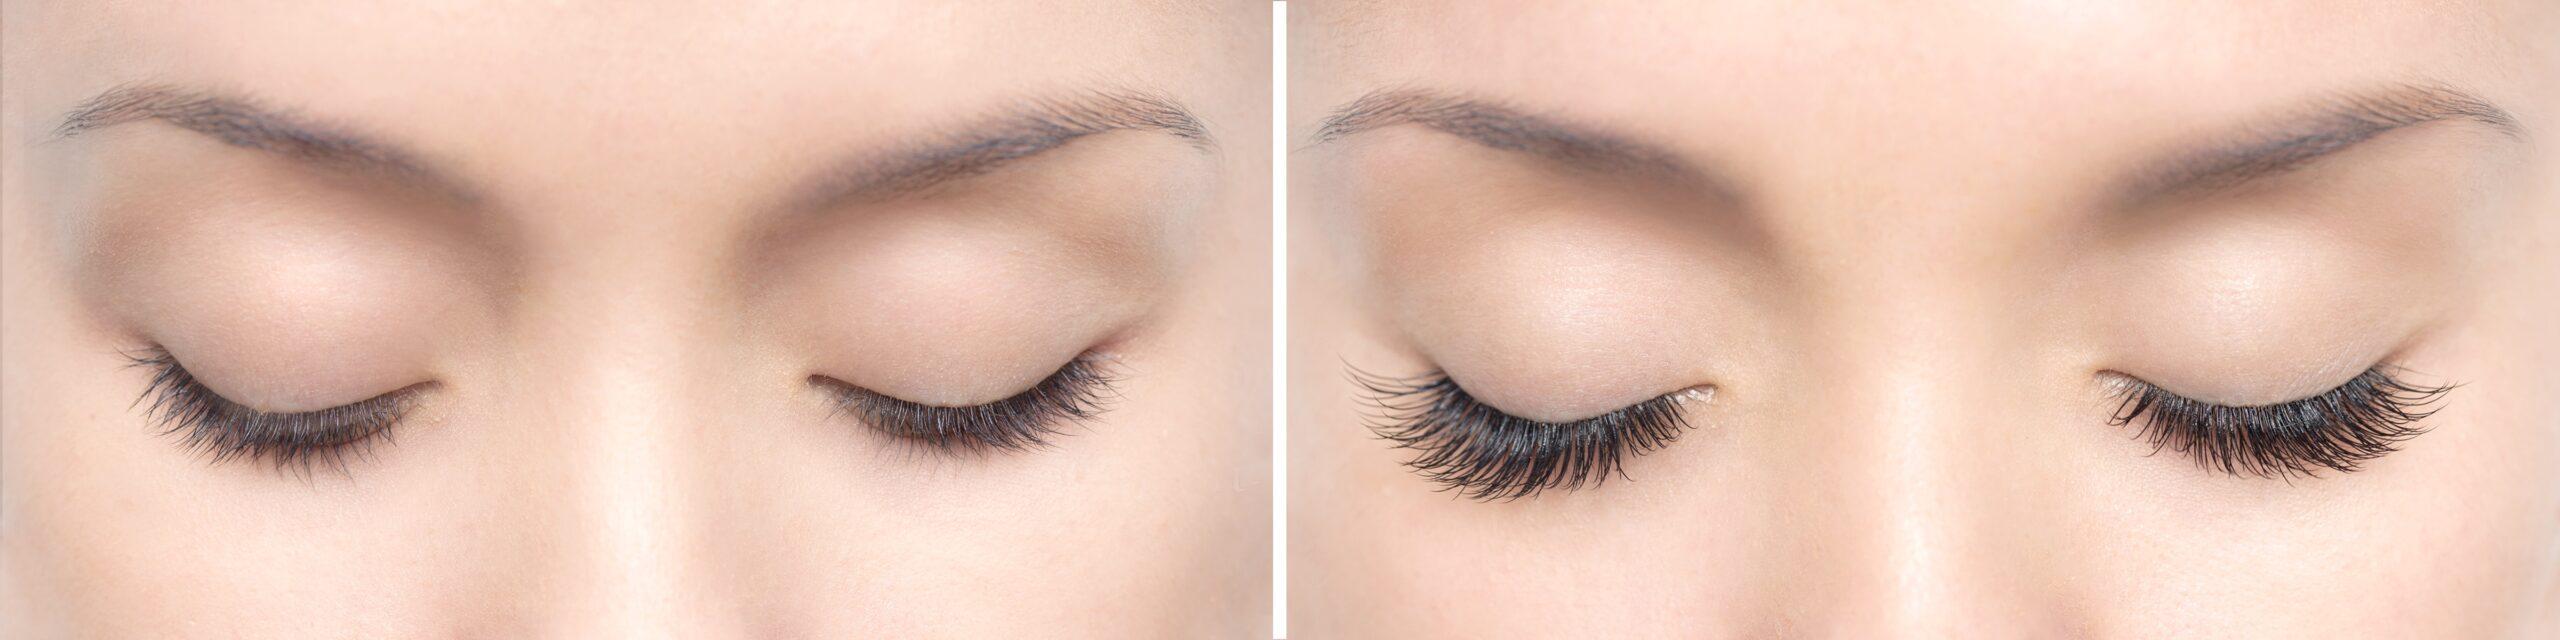 asian eyelash extensions